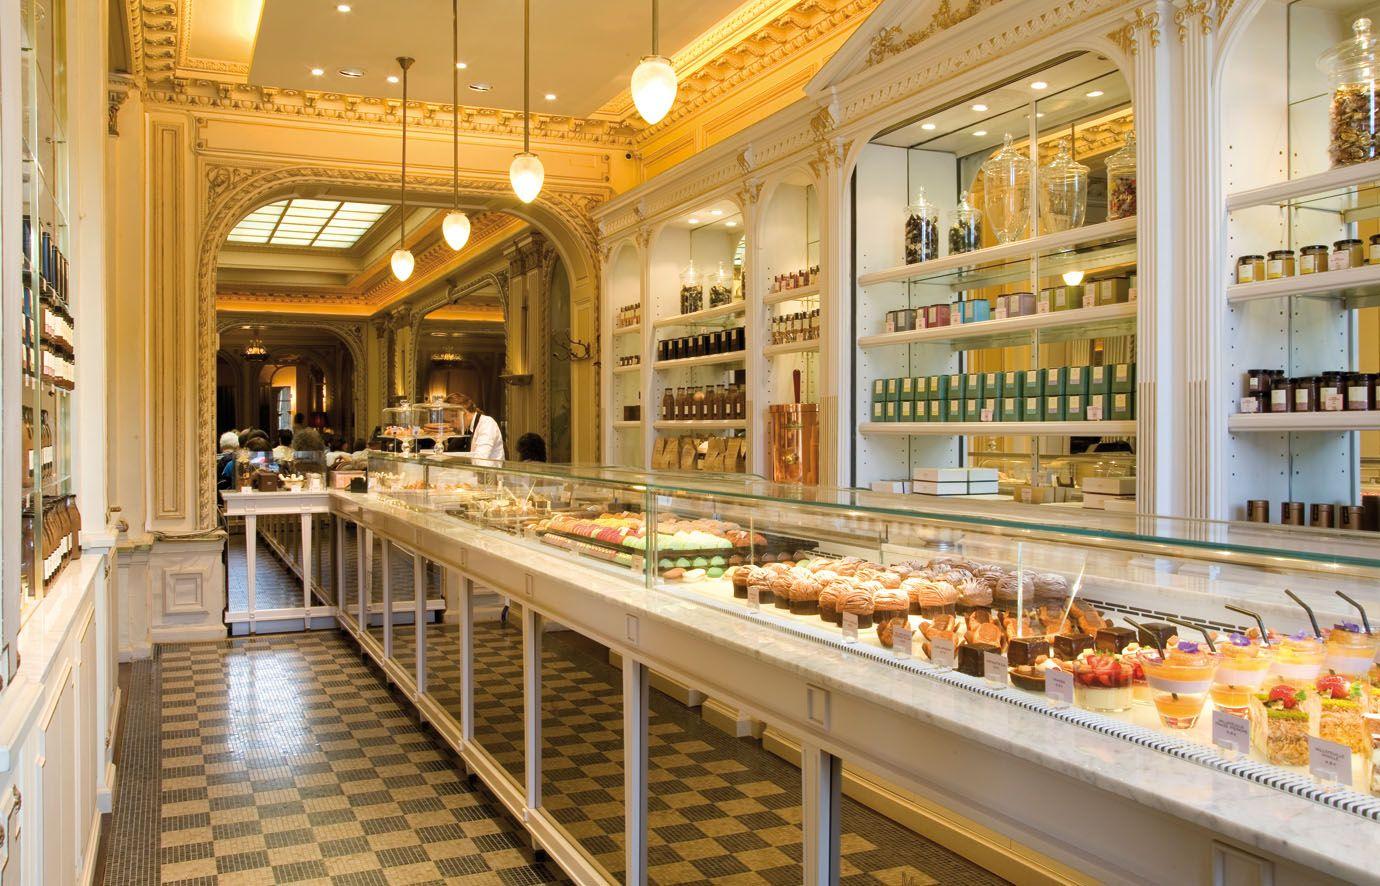 Angelina tea room we just love this iconic salon de th set rue de rivoli their signature - Salon de the rue de rivoli ...